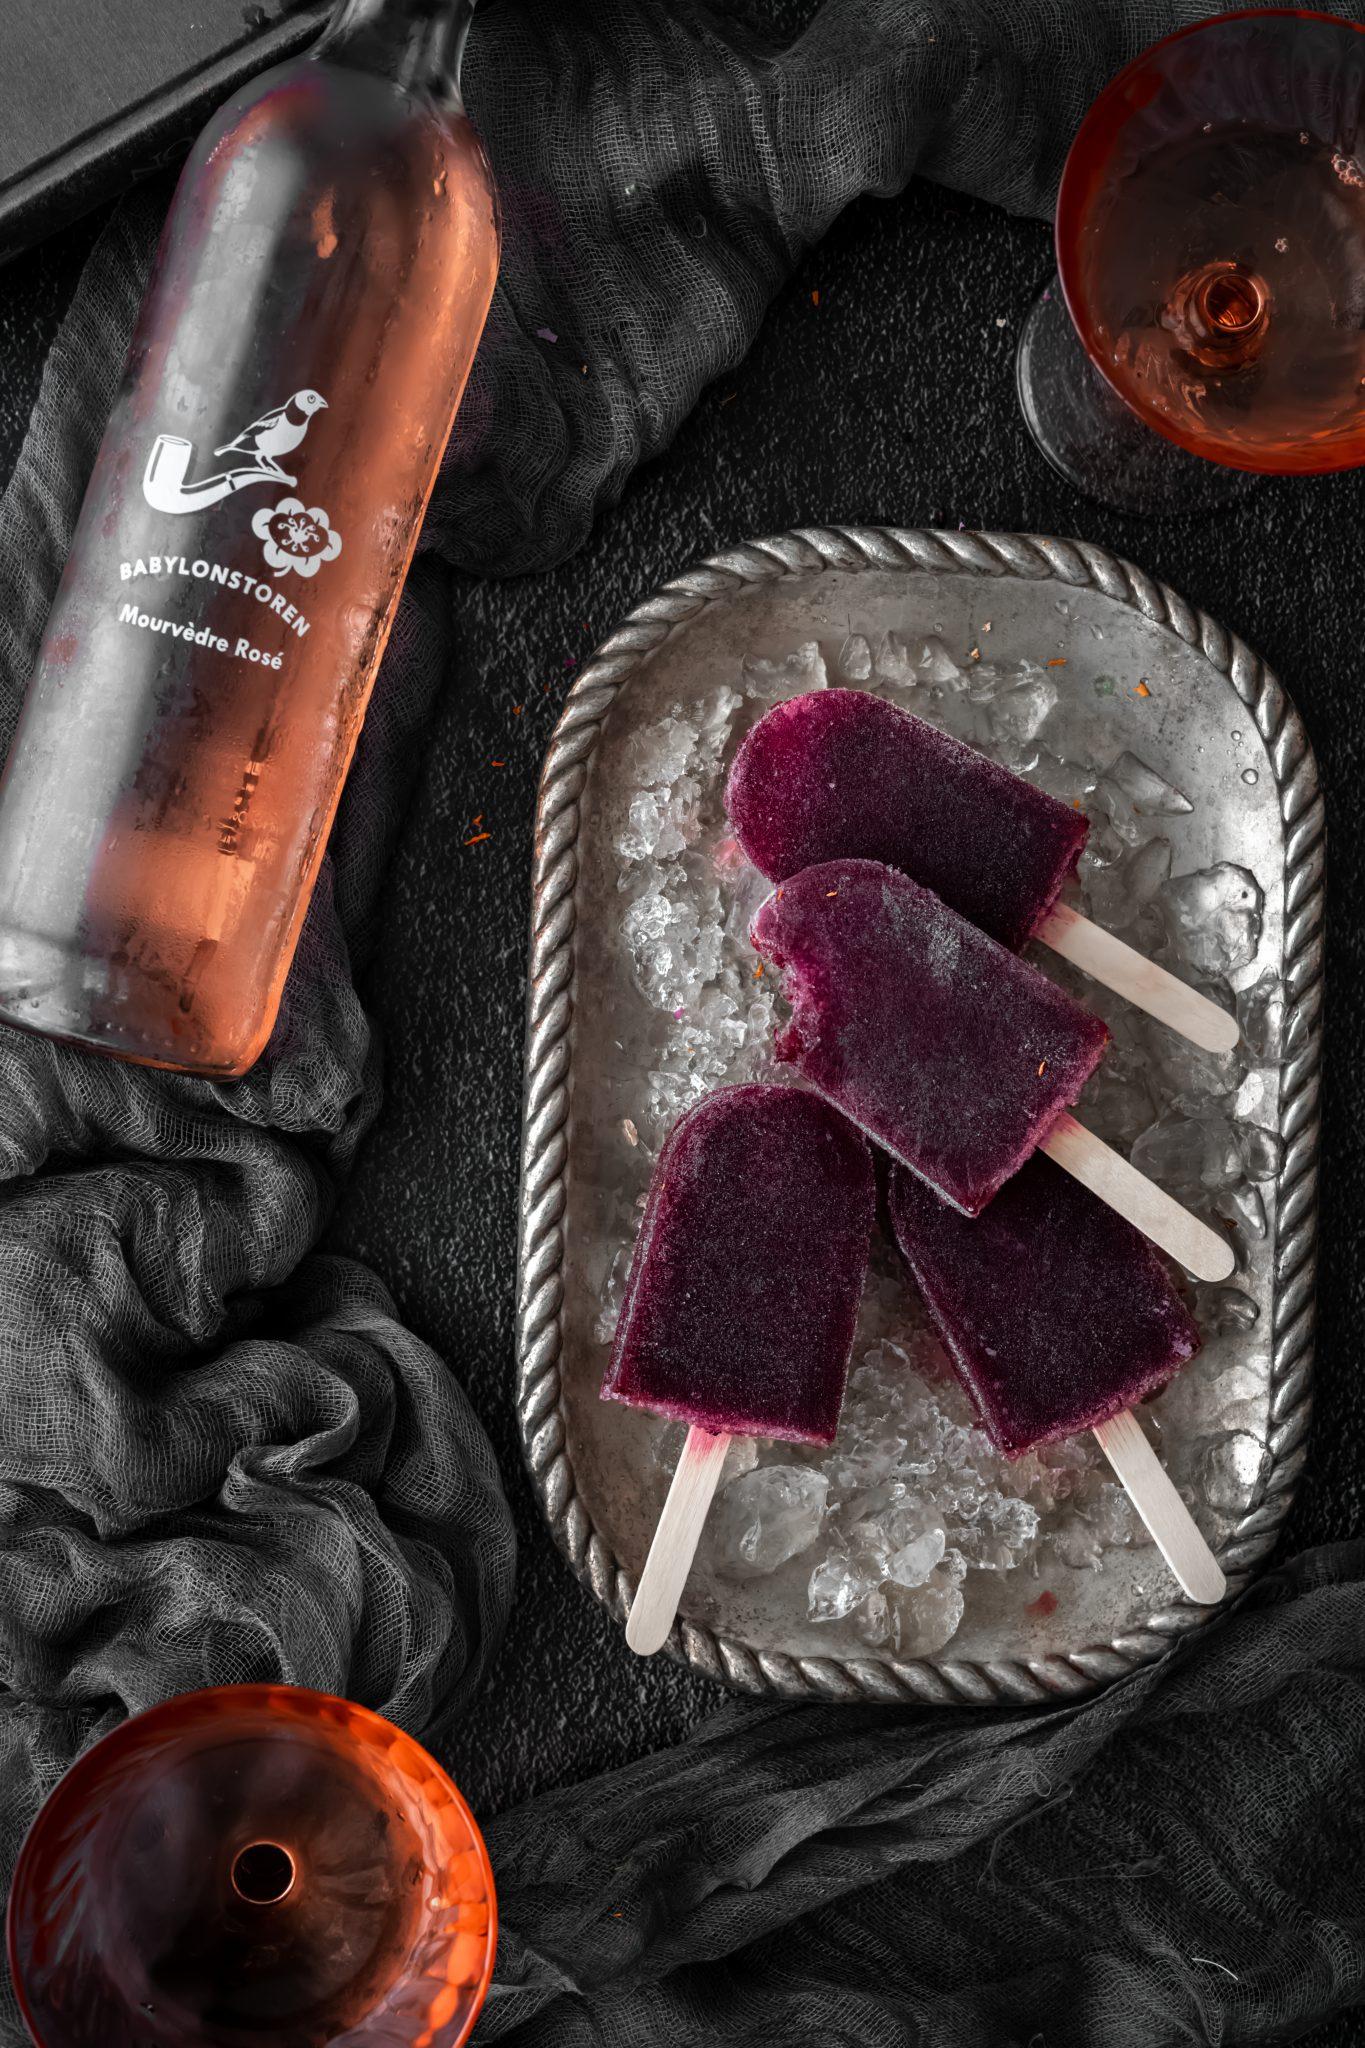 blueberry rosé ice lollies.